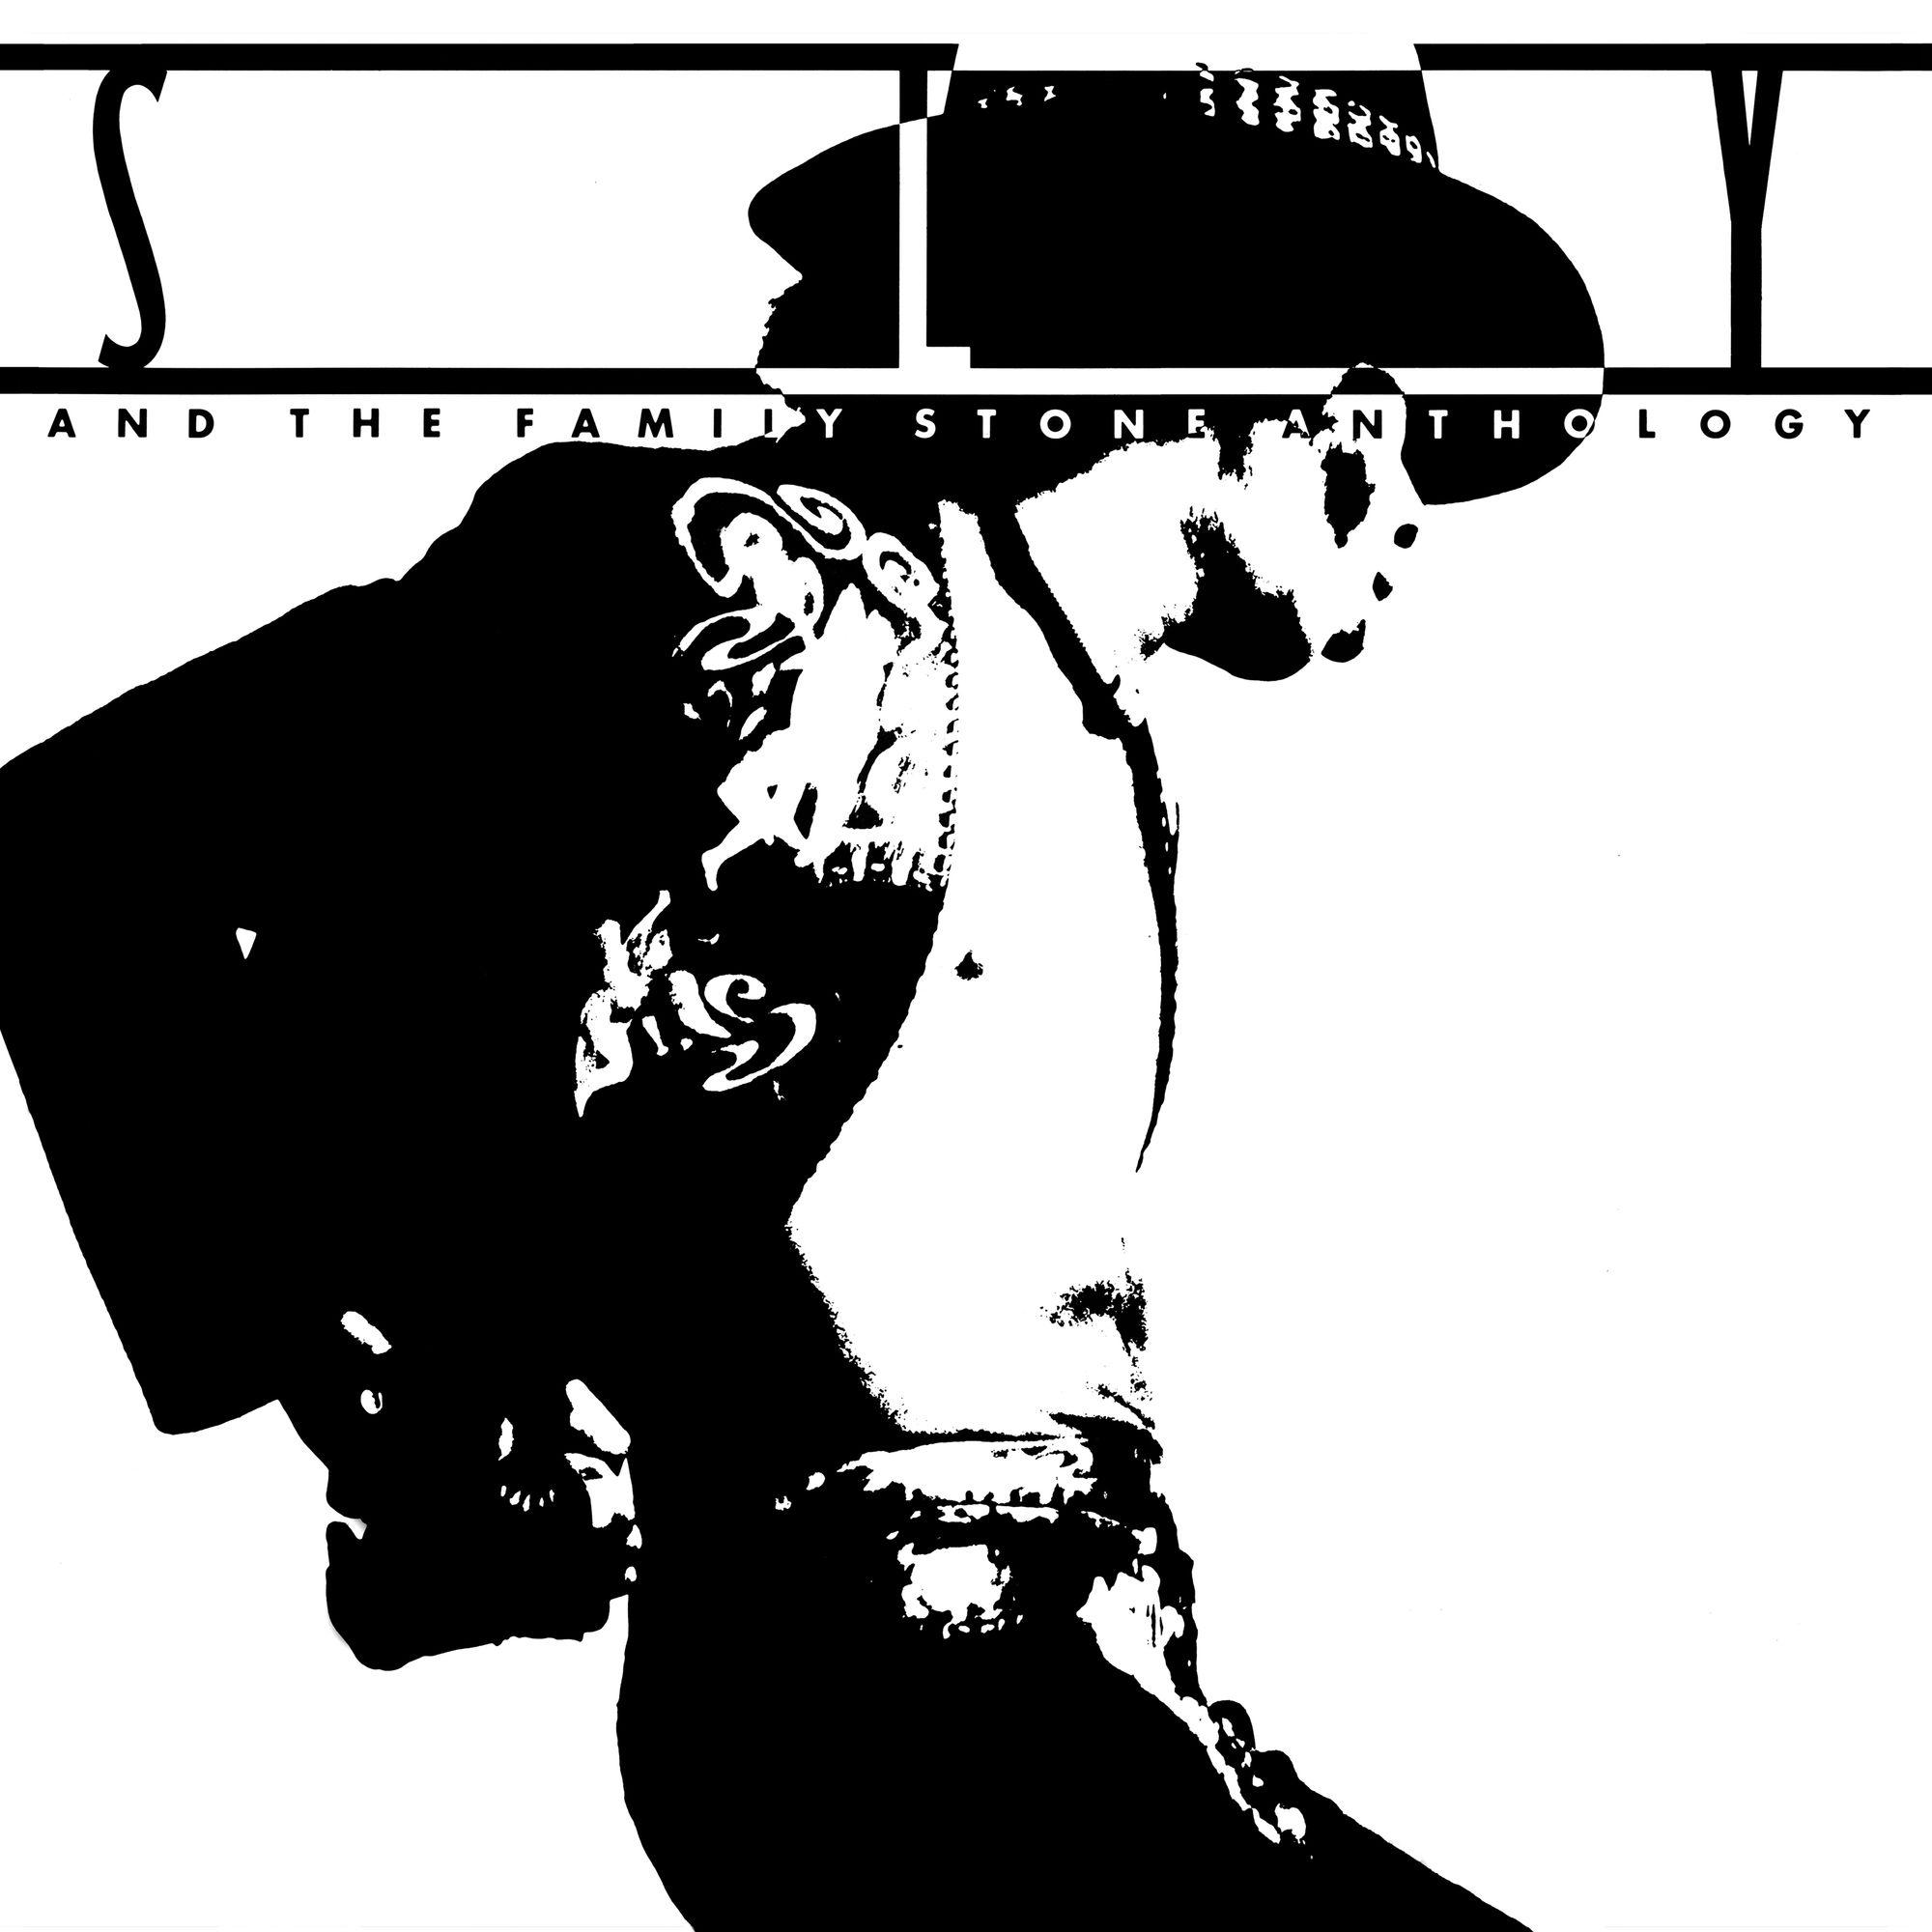 SLY & THE FAMILY STONE - ANTHOLOGY - GREATEST HITS (180 GRAM BLACK WHITE & GRAY SWIRL AUDIOPHILE VINYL/LIMITED EDITION)